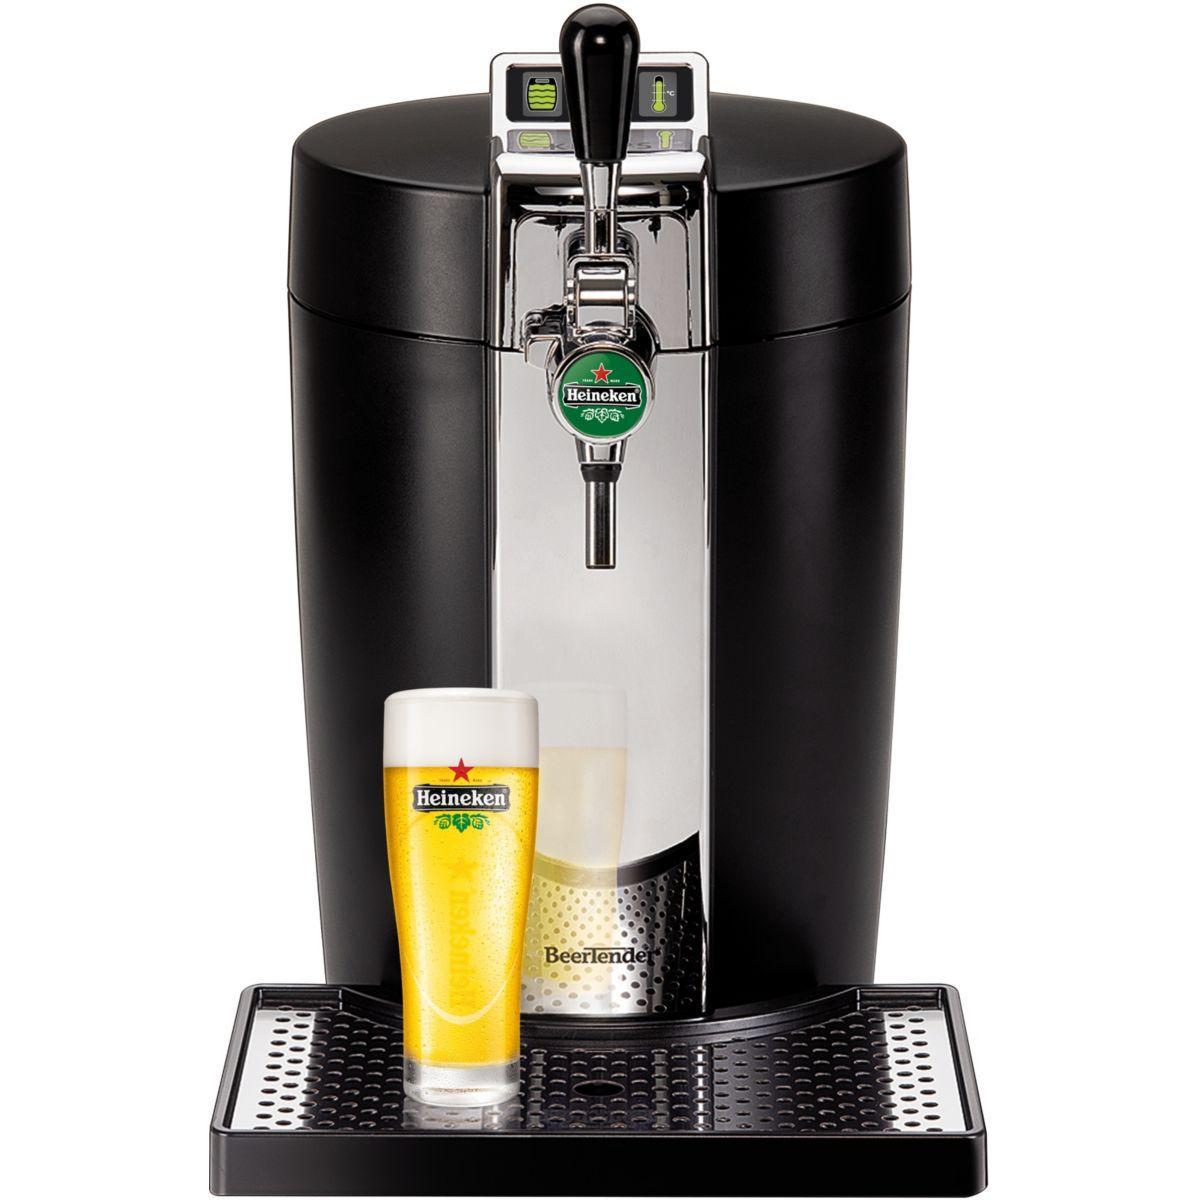 Tireuse � bi�re krups yy2932fd beertender noir - livraison offerte : code premium (photo)